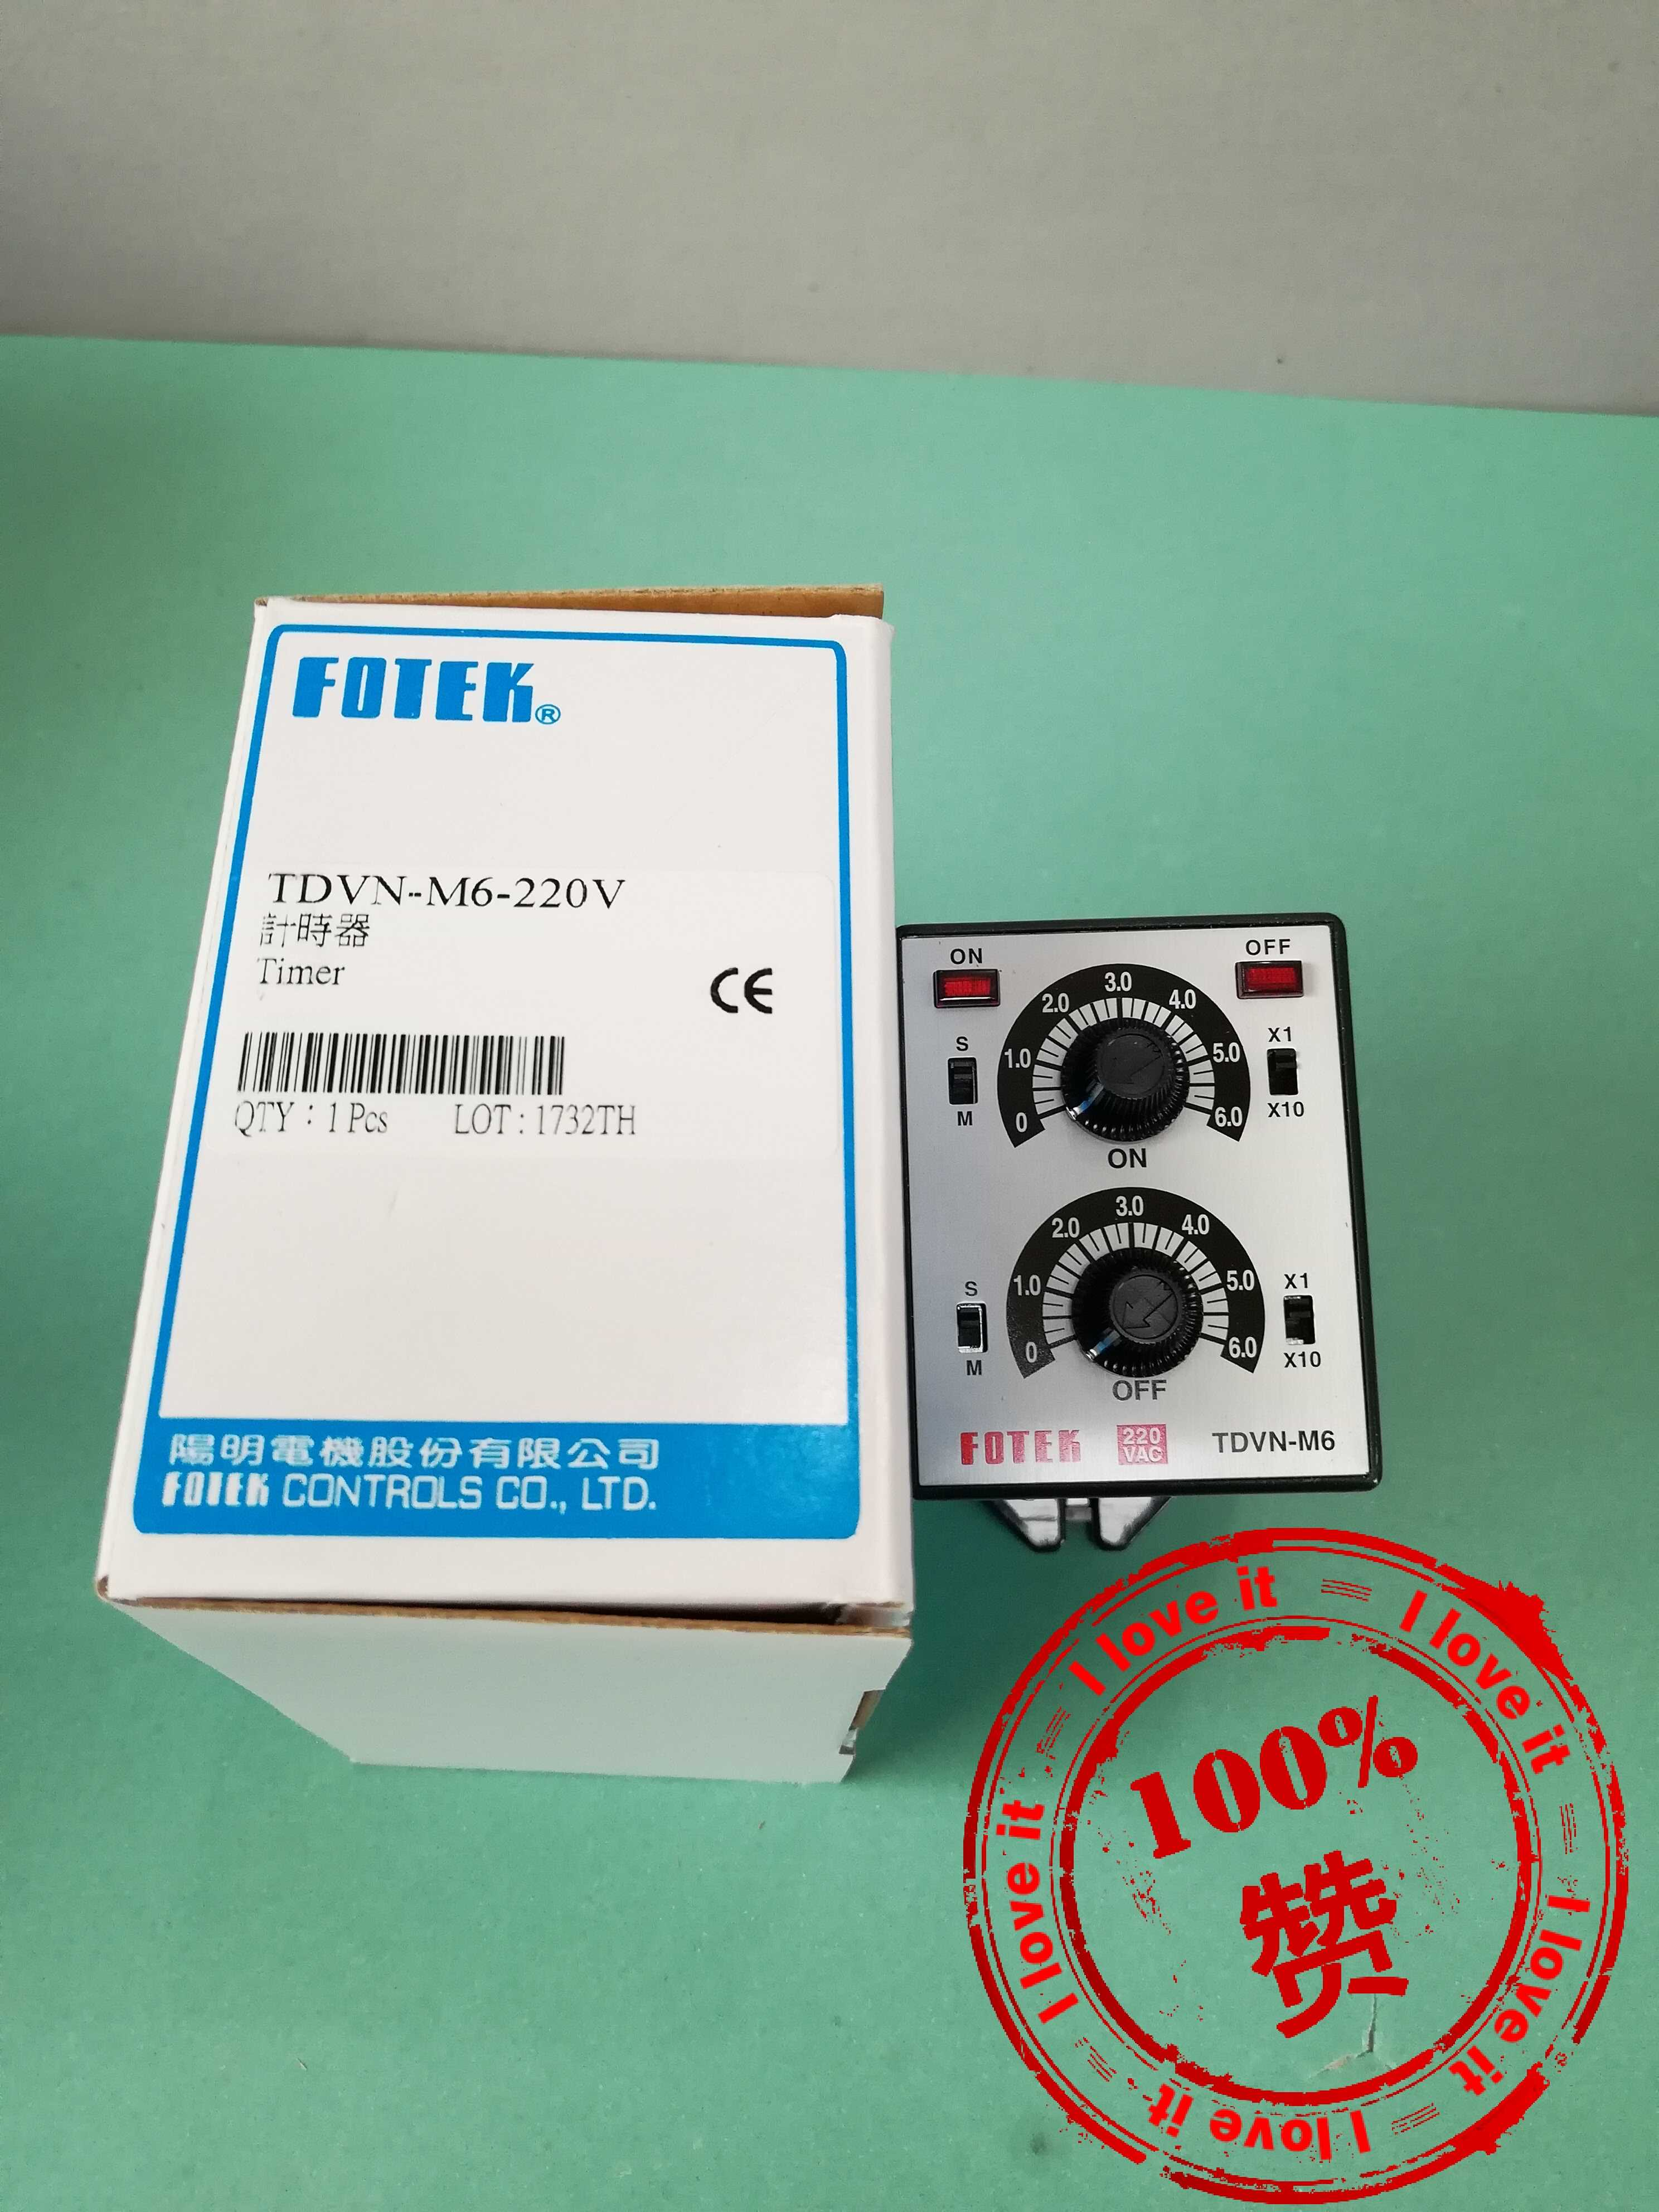 100% New Original TDVN-M6-220V Double-tone Timer